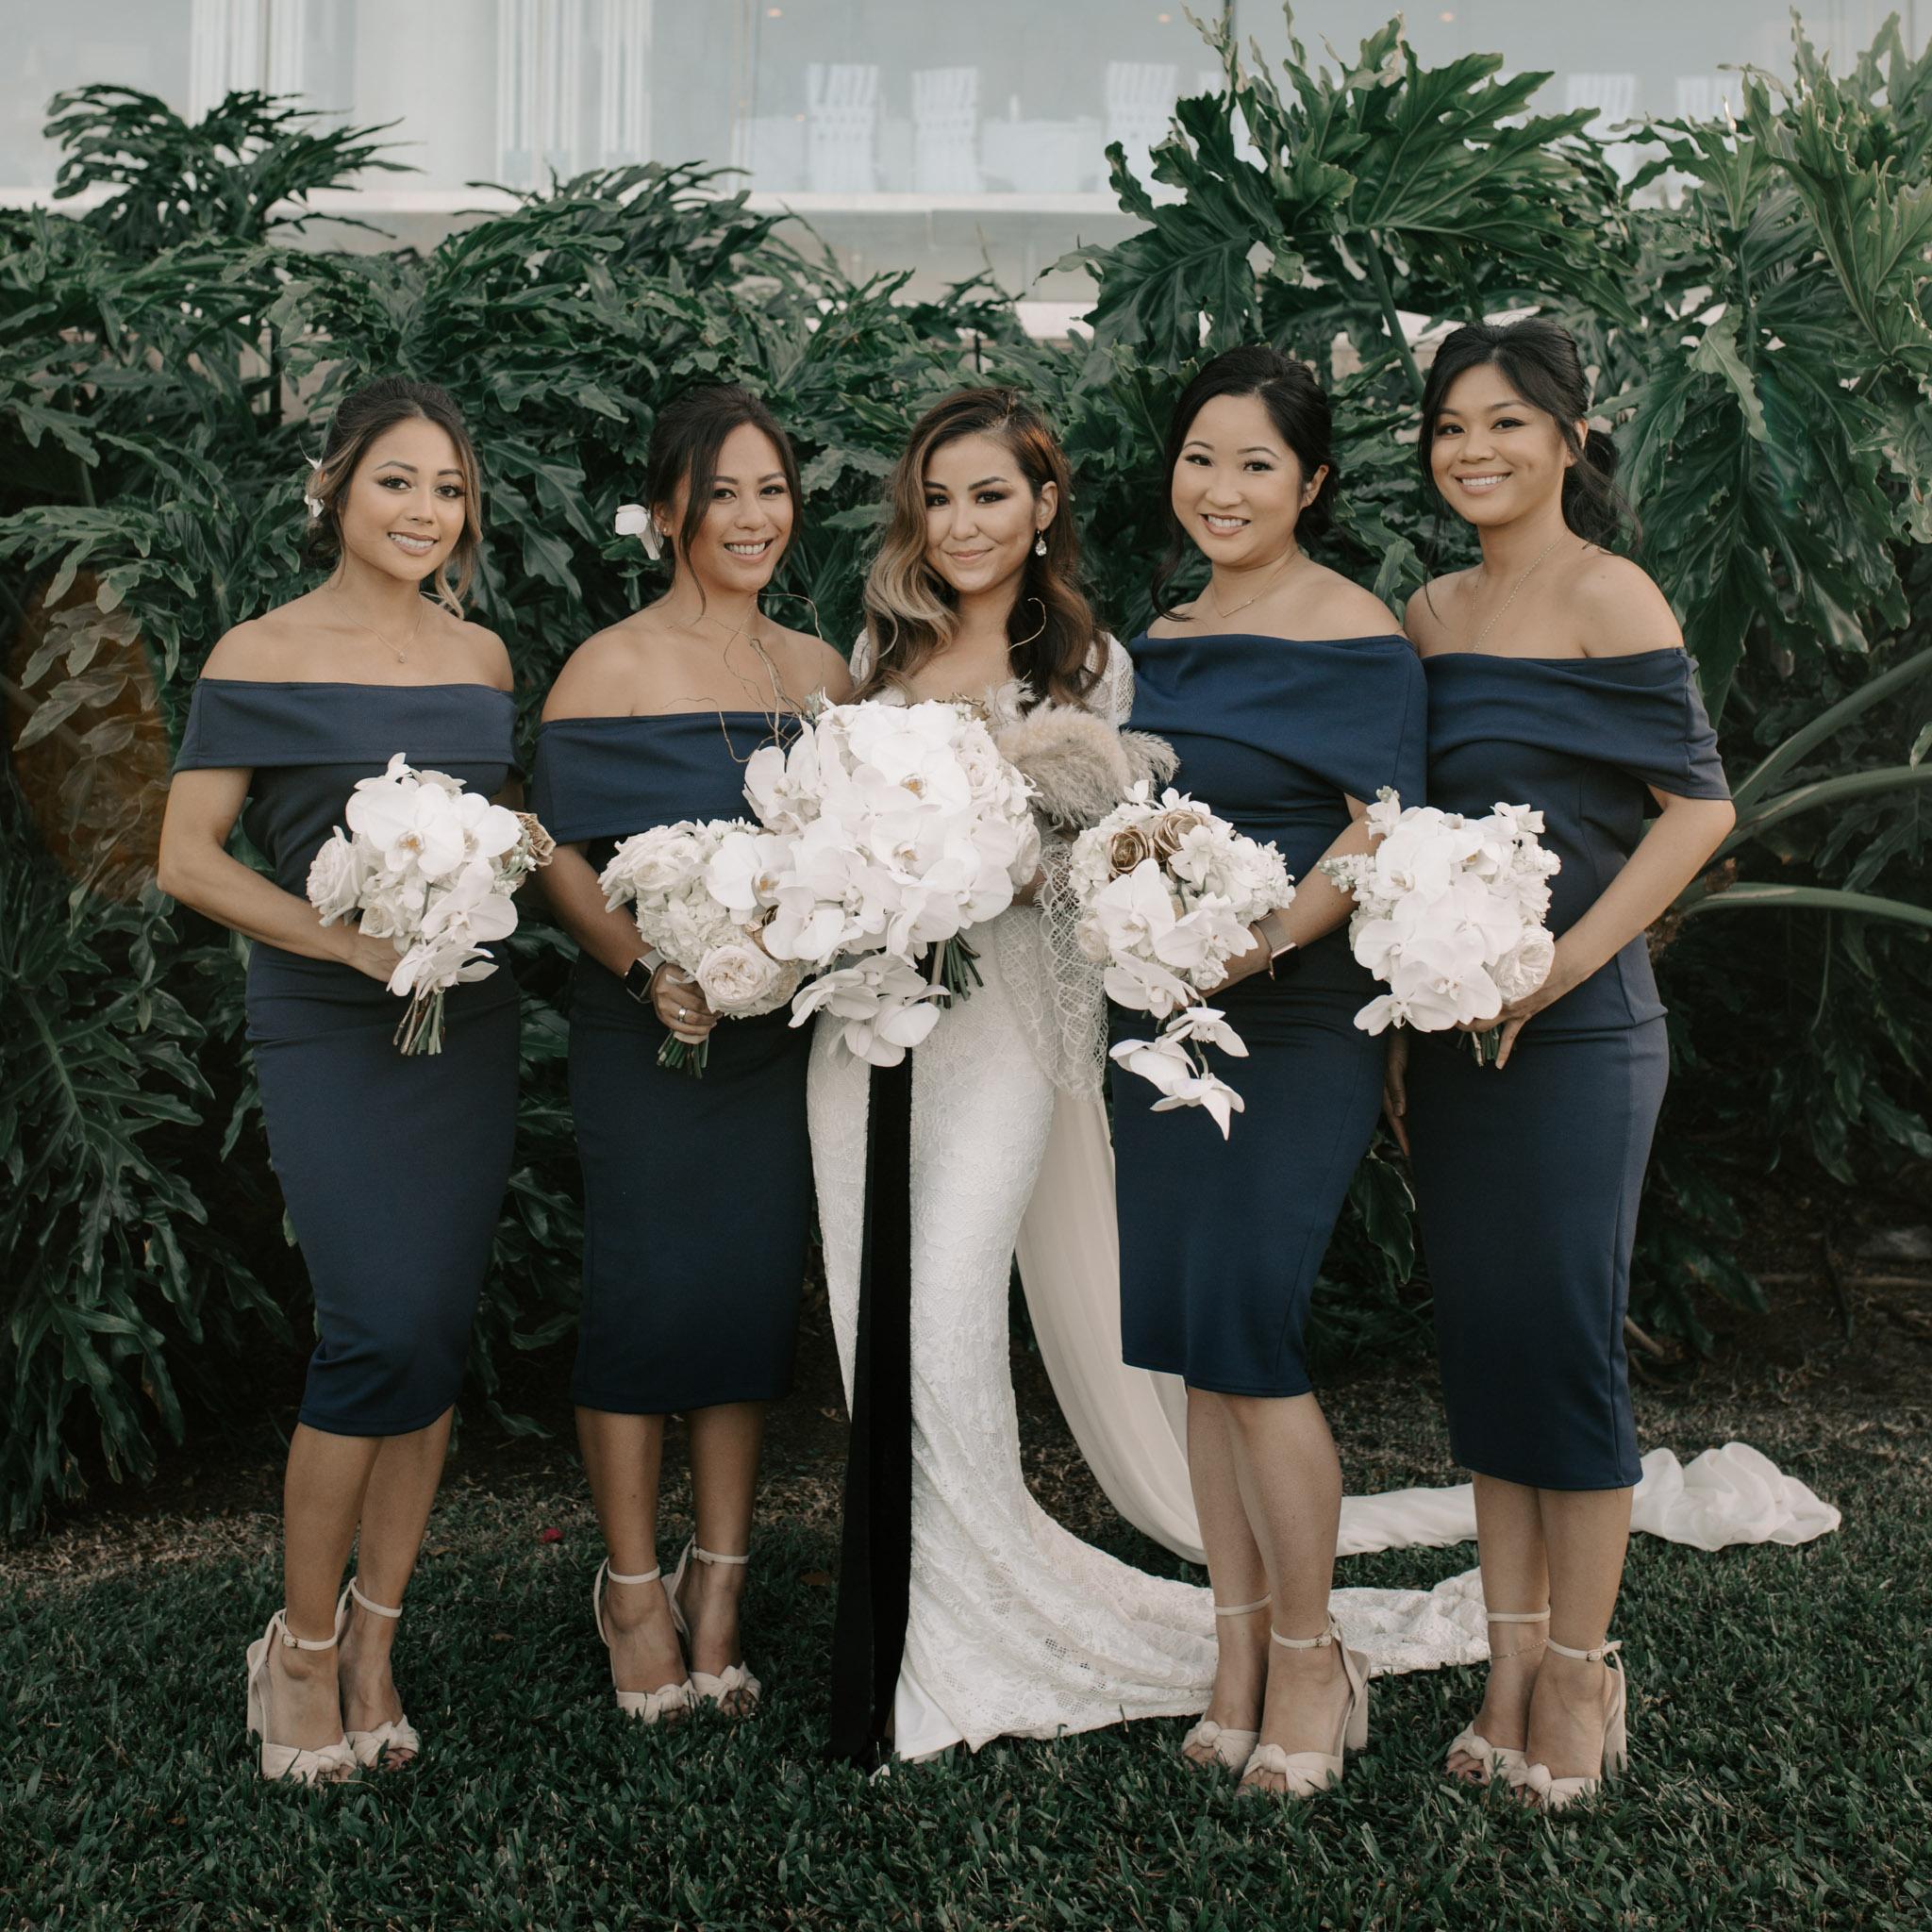 Bridesmaids portrait   Merriman's Kapalua Maui wedding by Hawaii wedding photographer Desiree Leilani